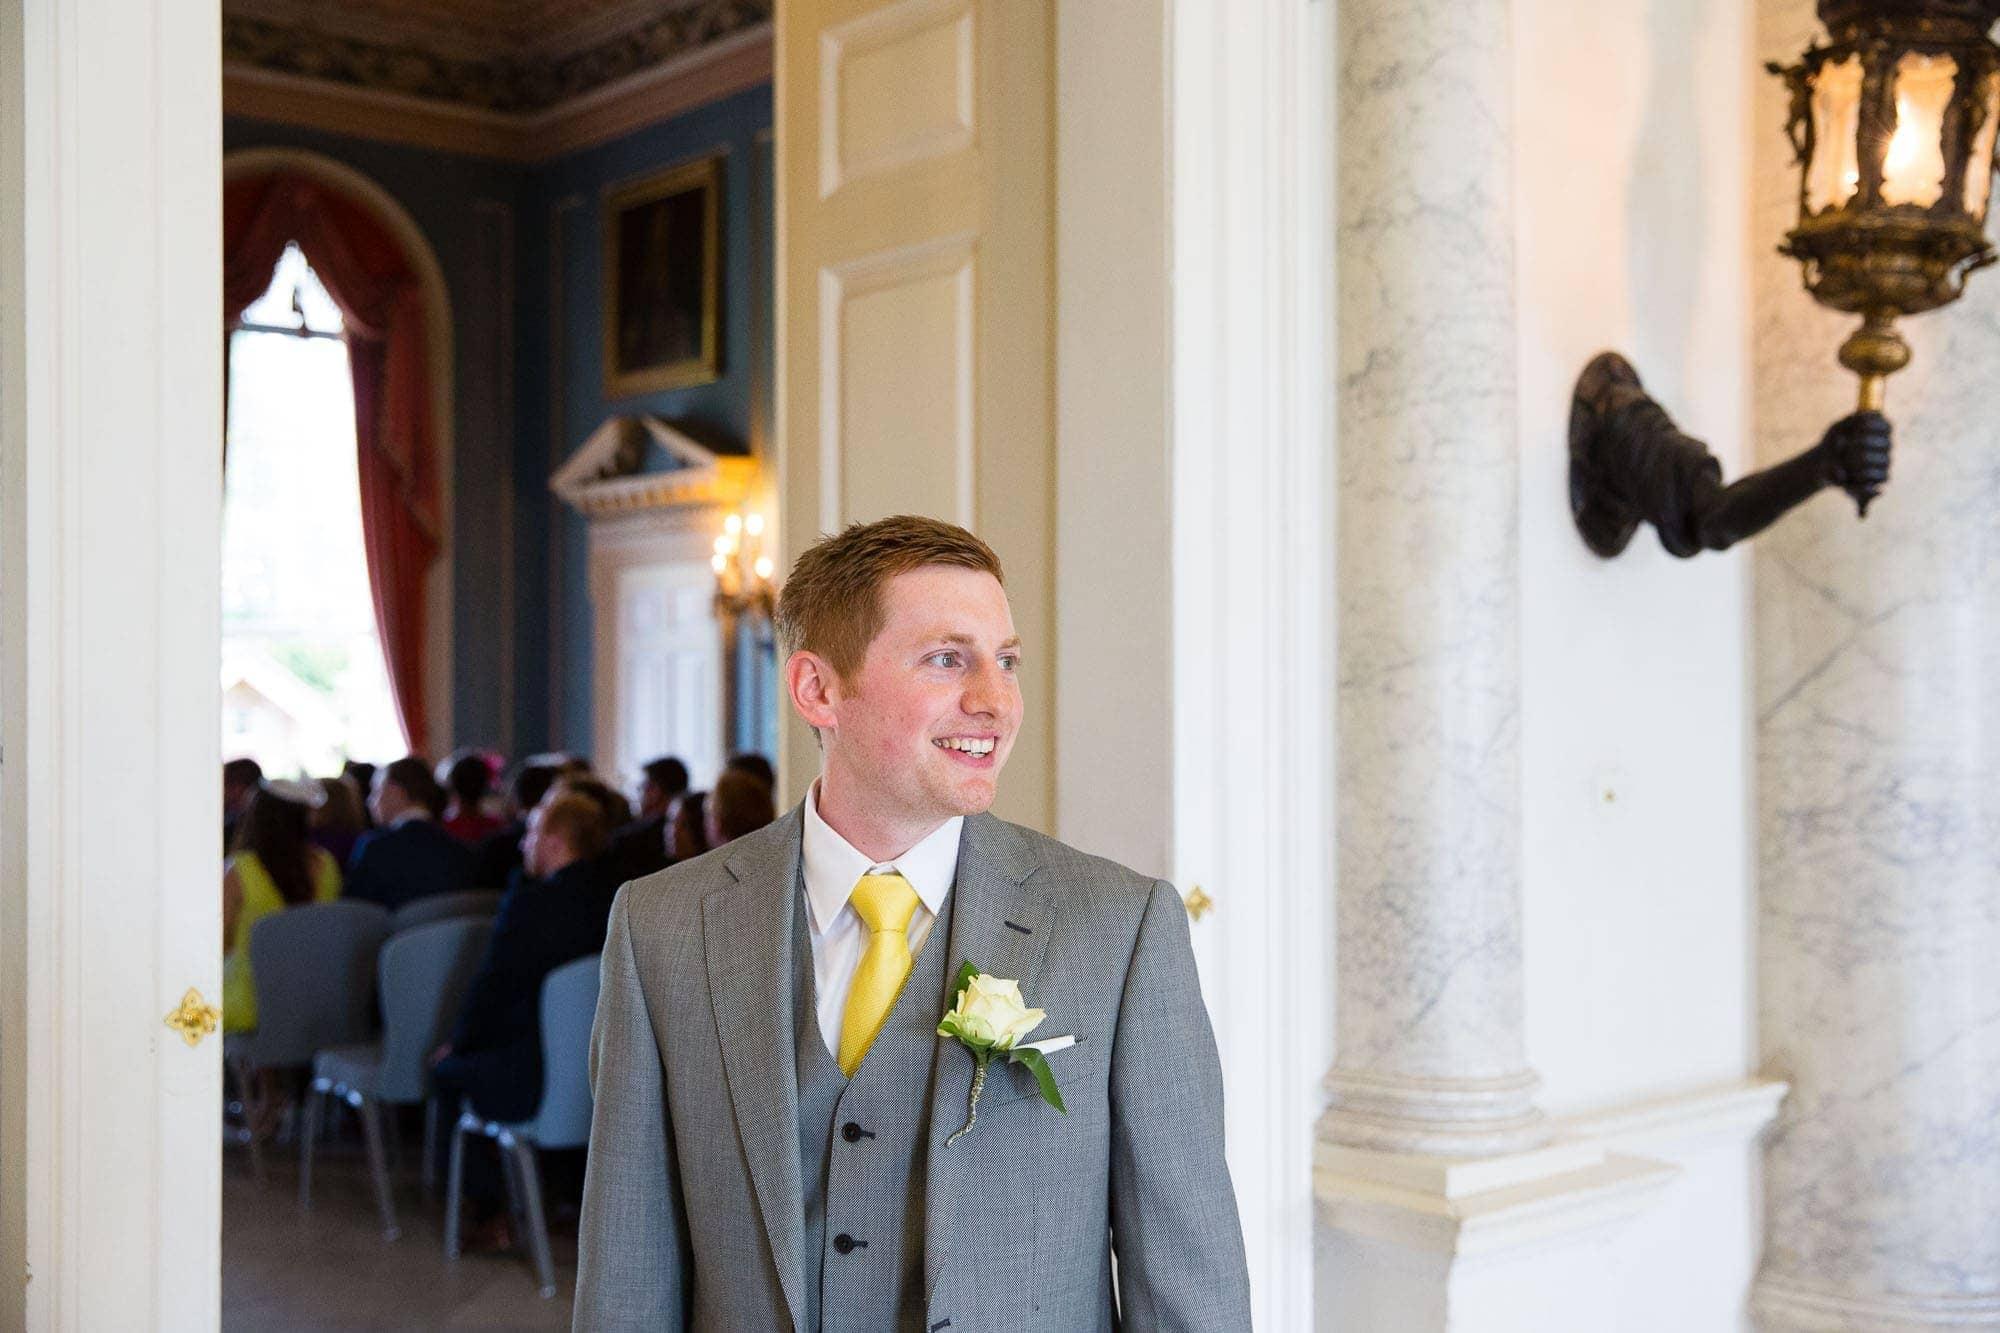 Clandon Park Wedding Photographer 30 5342